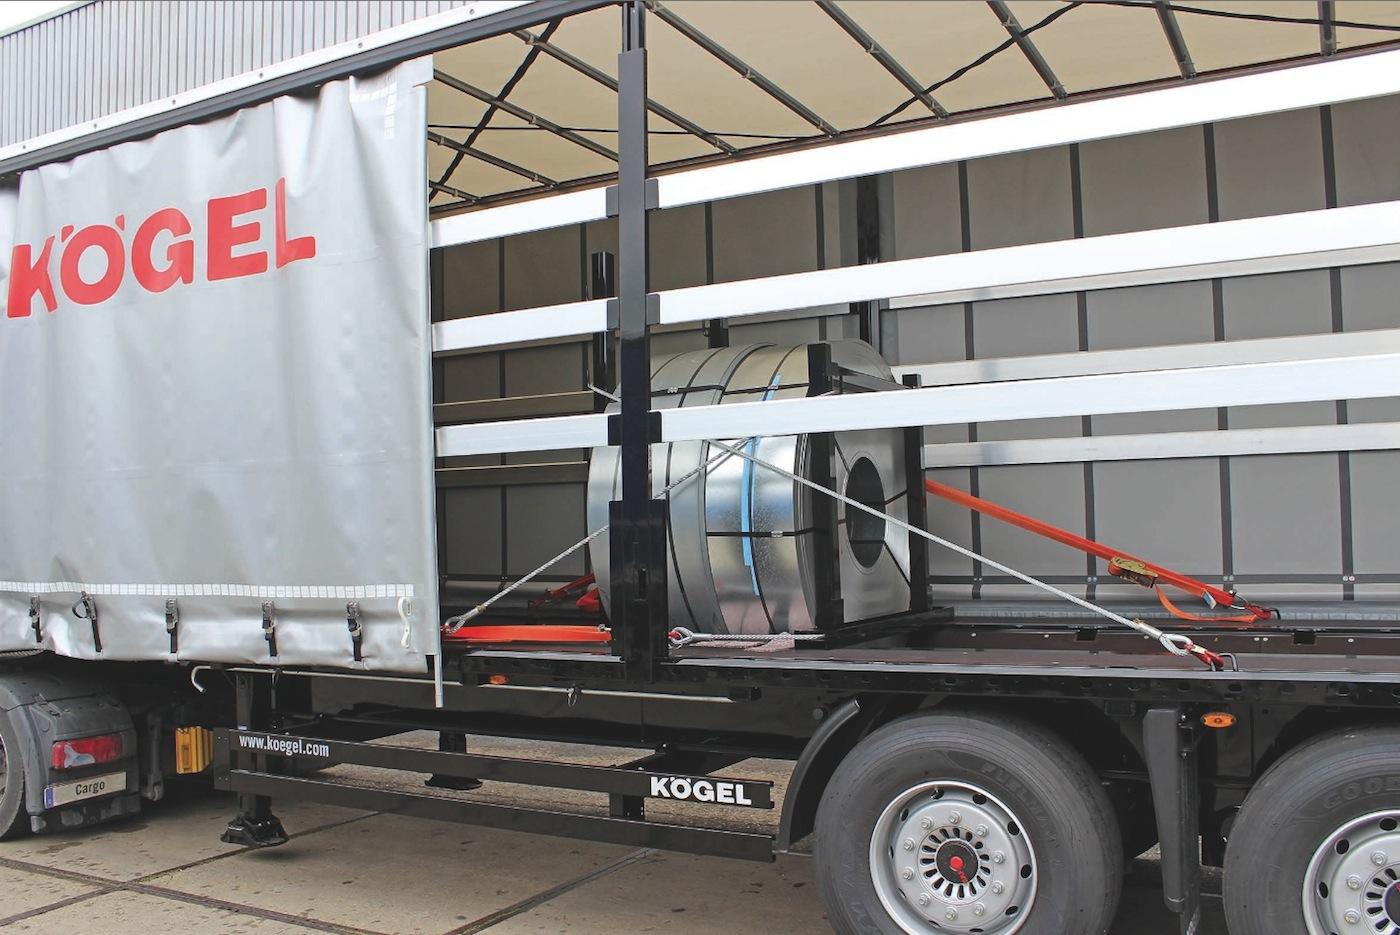 kogel-instala-nuevos-semirremolques-cargo-coil-transporte-bobinas